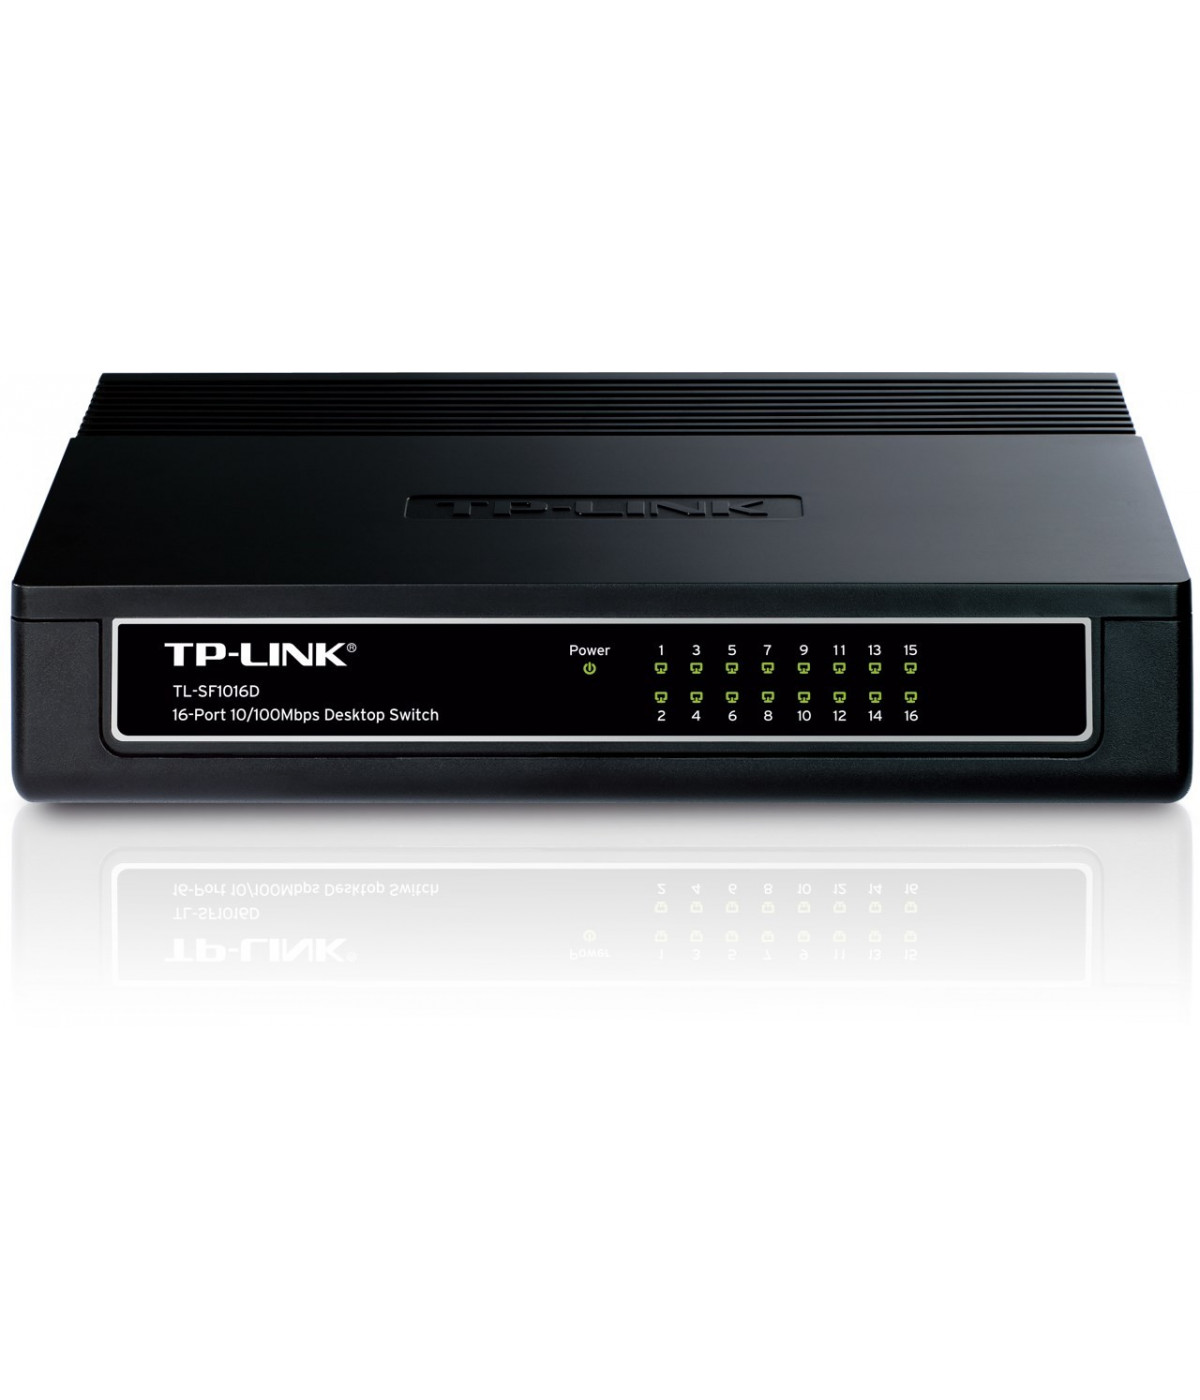 ROUTER TP-LINK TL-SF1016D